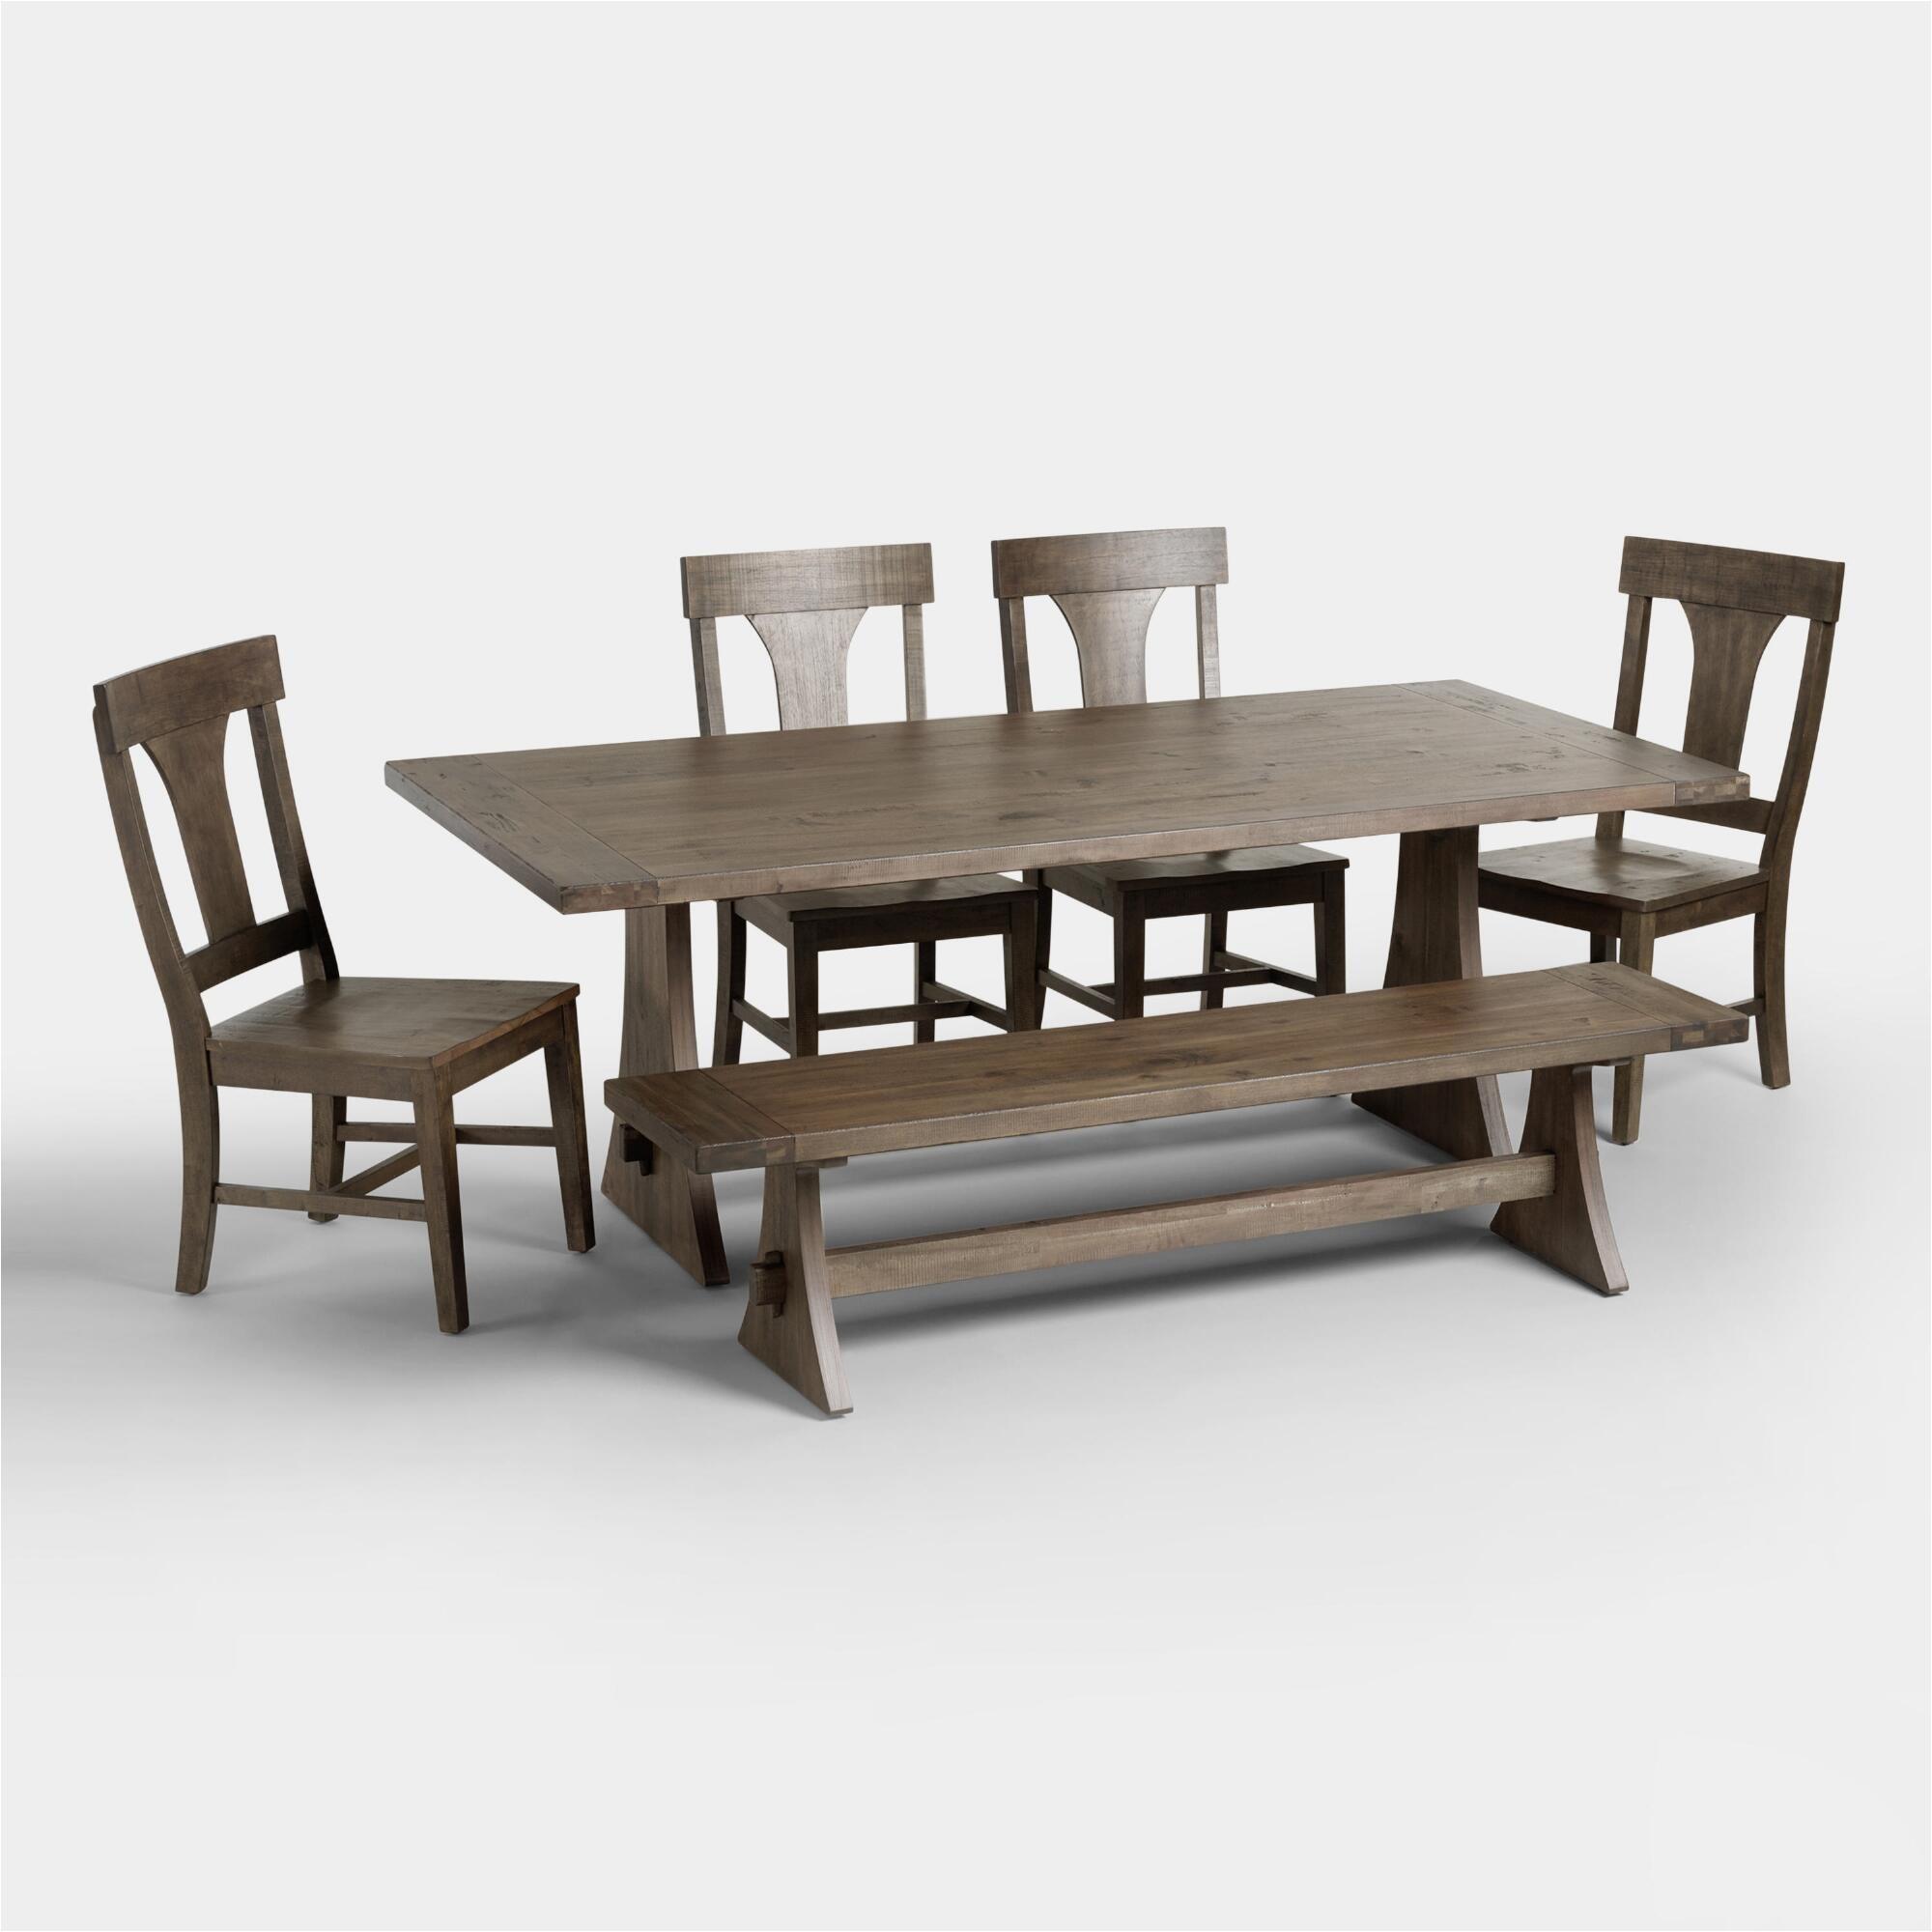 prepossessing world market dining room chairs at world market dining room chairs elegant chair danish modern